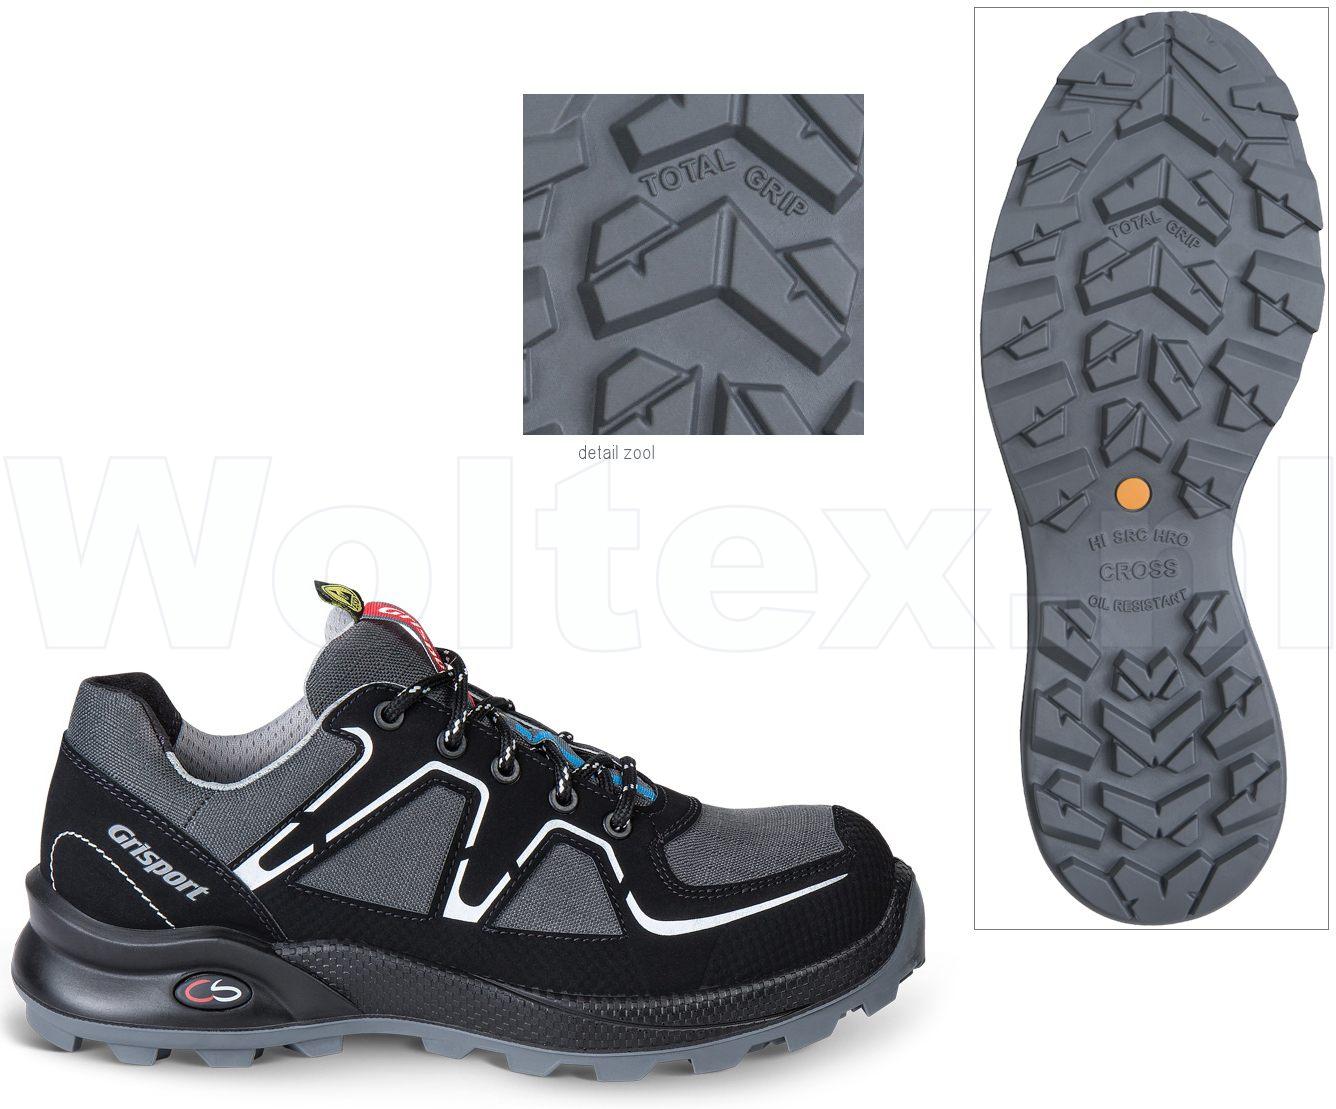 Antislip Werkschoenen Dames.Grisport Cross Safety Dames S3 Werkschoenen Laag Ariel Veilige Neus